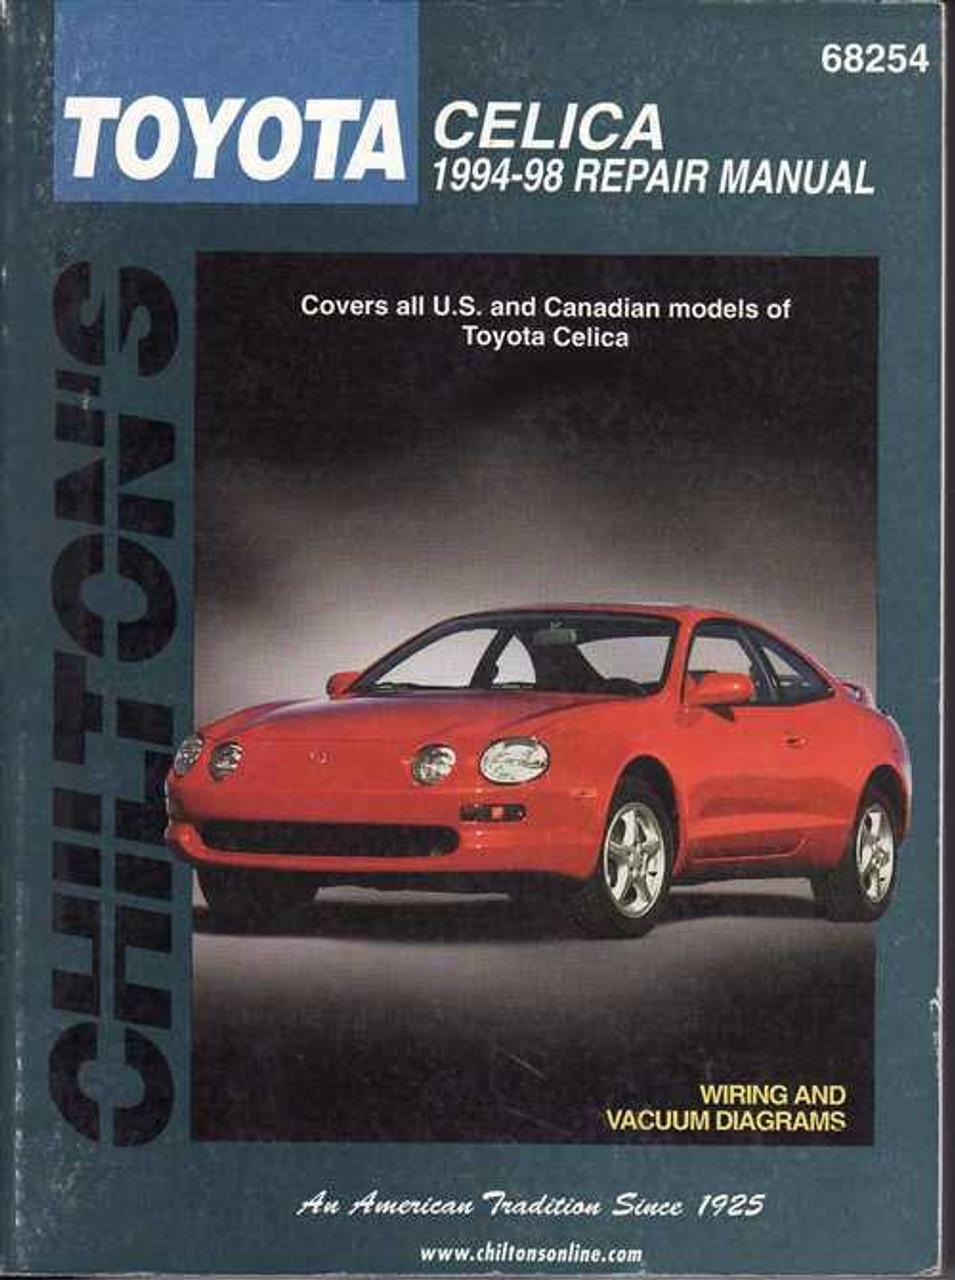 toyota celica 1994 1998 workshop manual98 Toyota Celica Engine Diagram #14